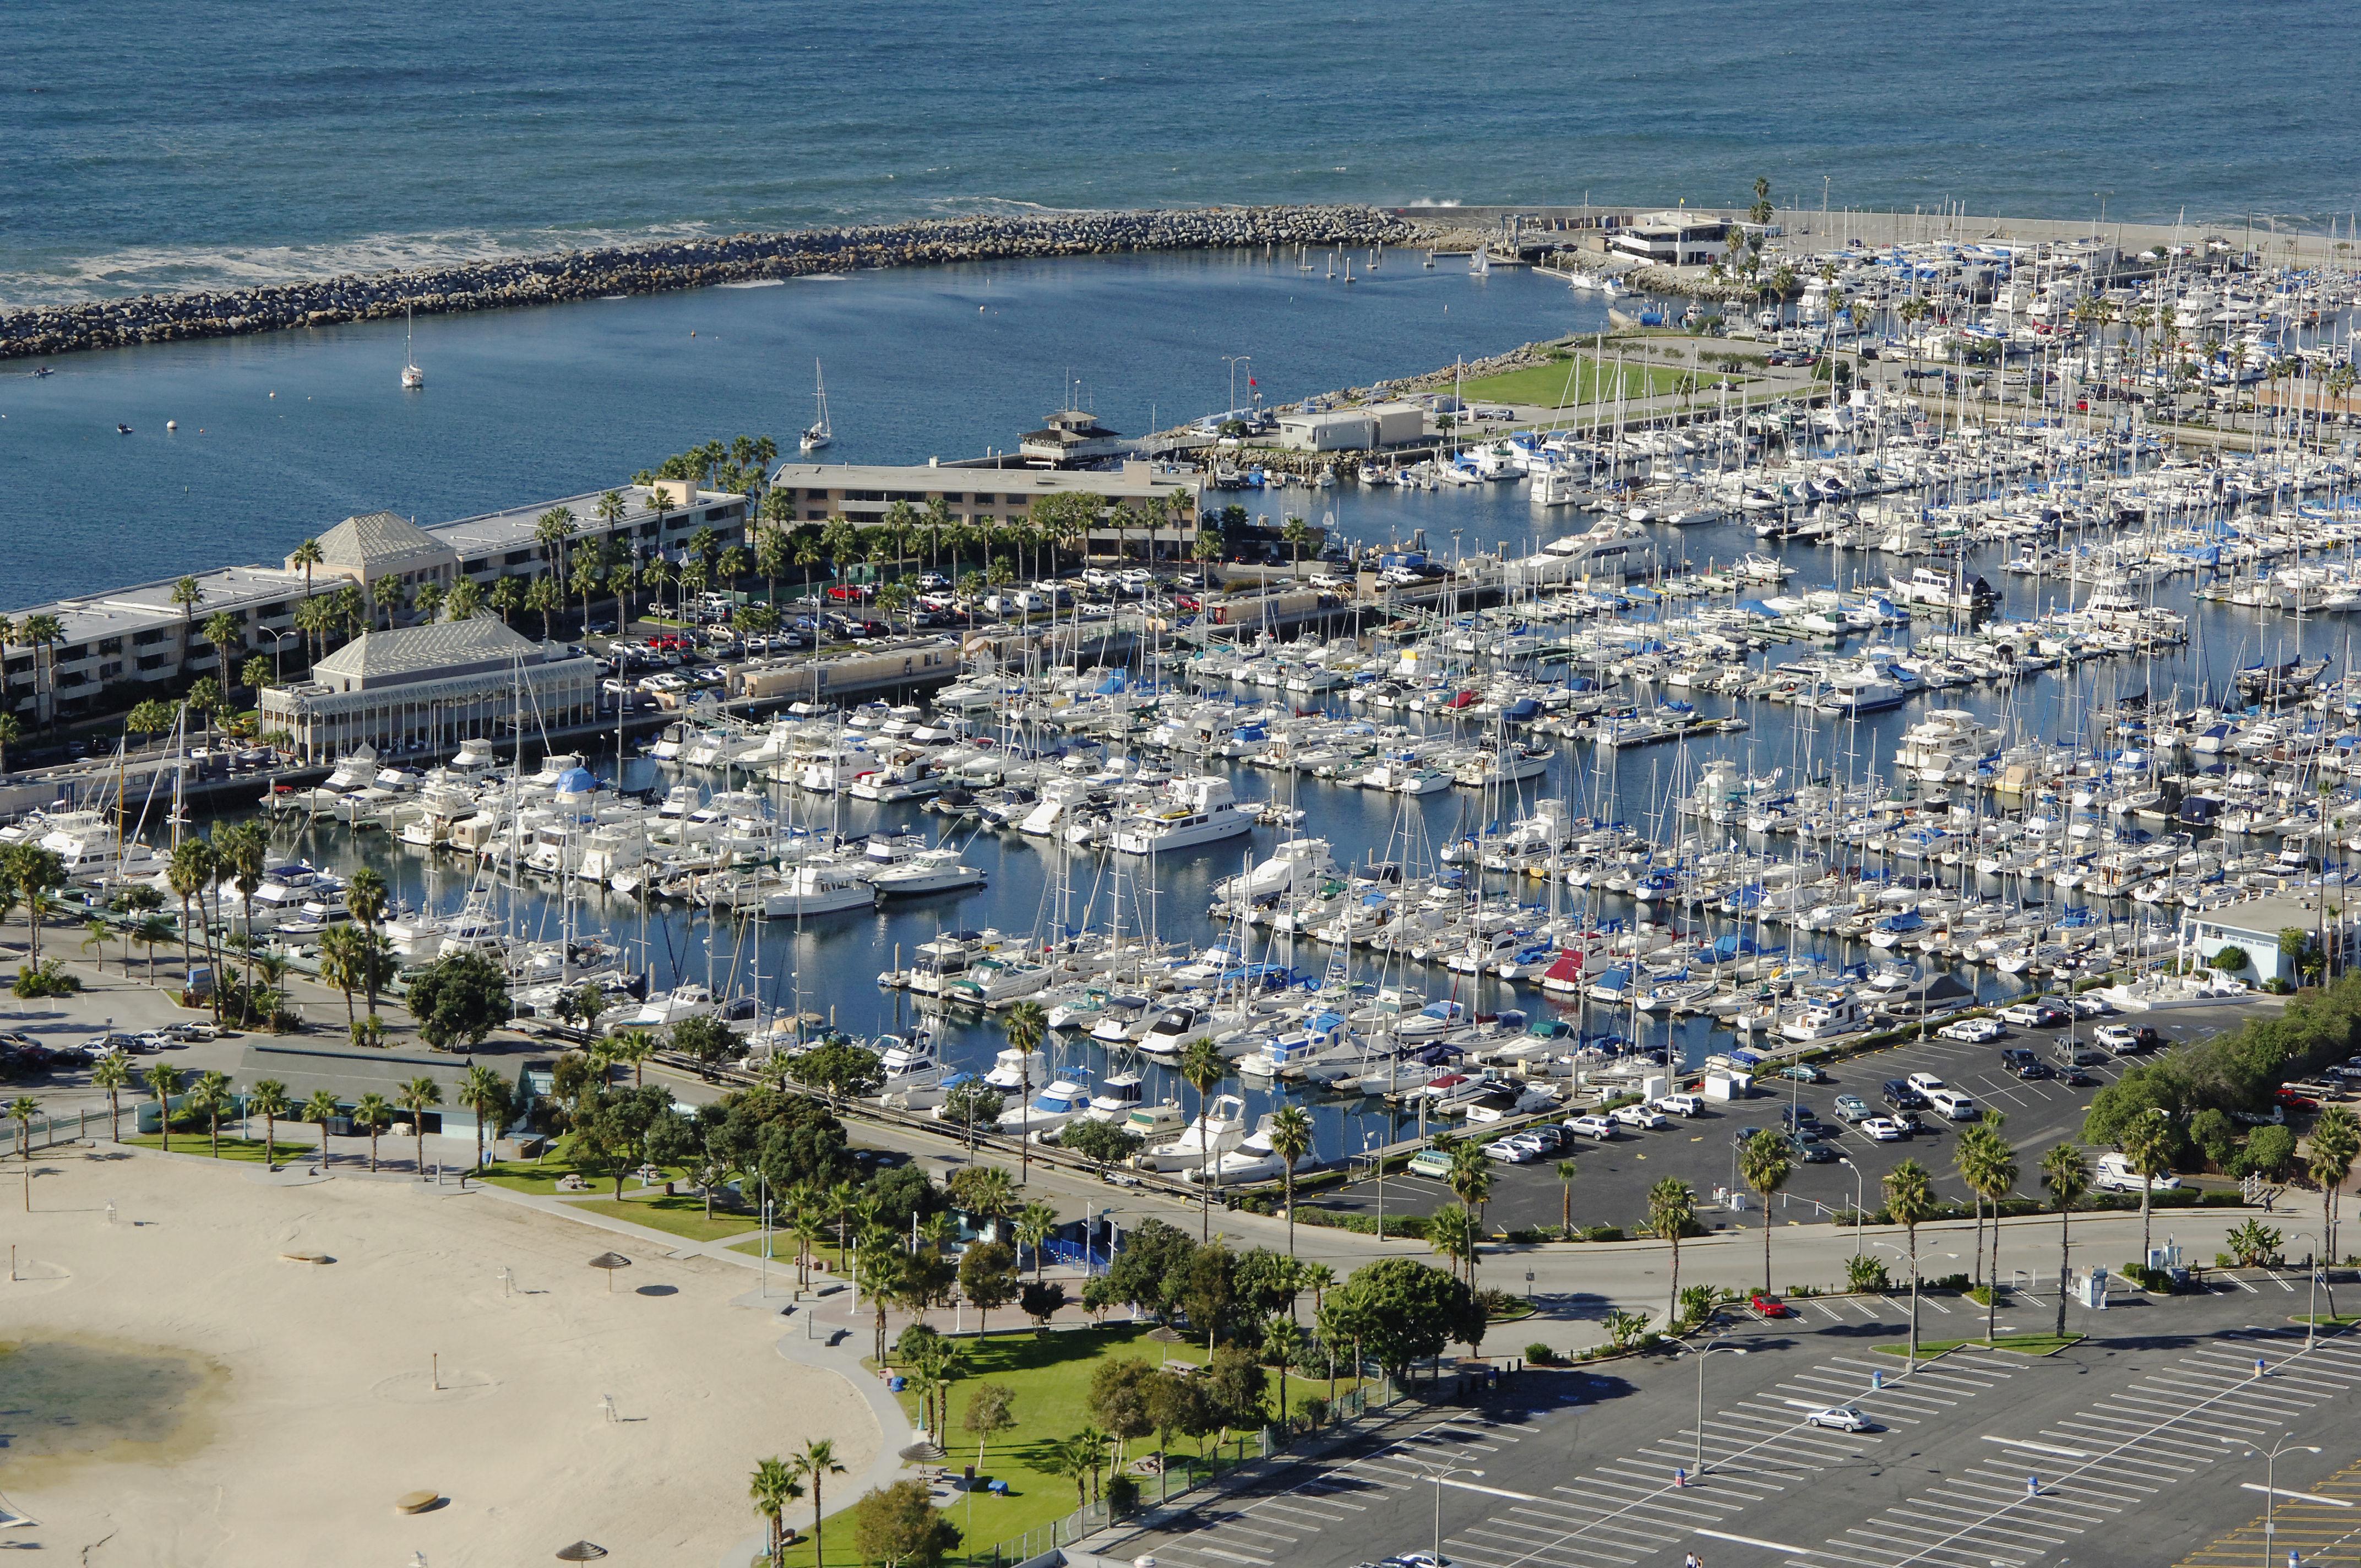 Portofino Hotel Yacht Club